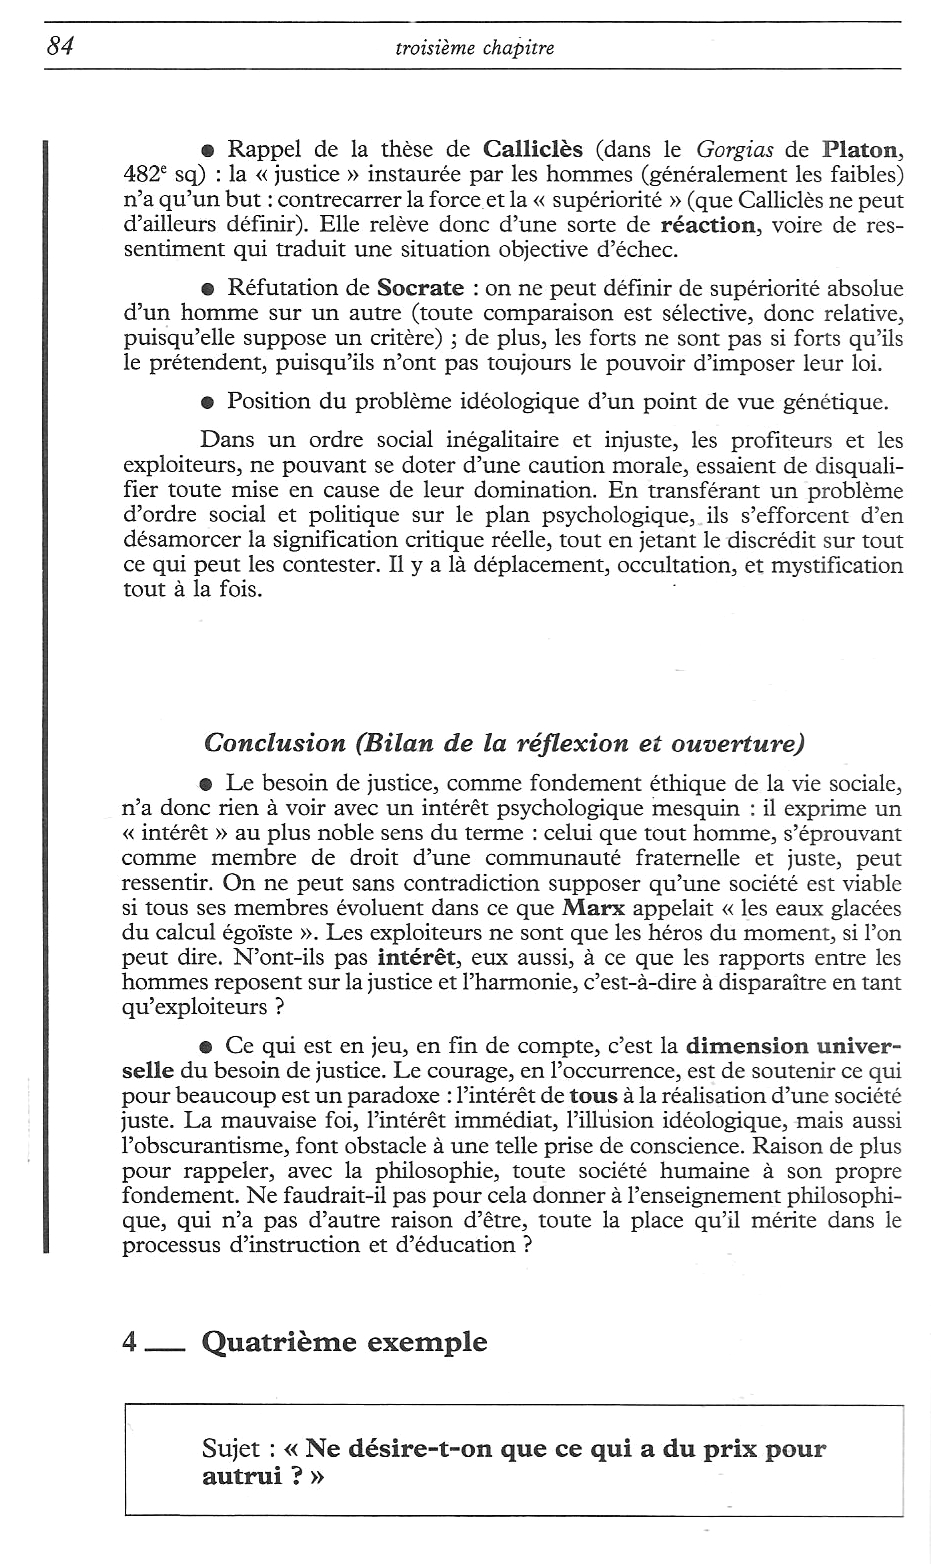 Dissertation sur la representation theatrale